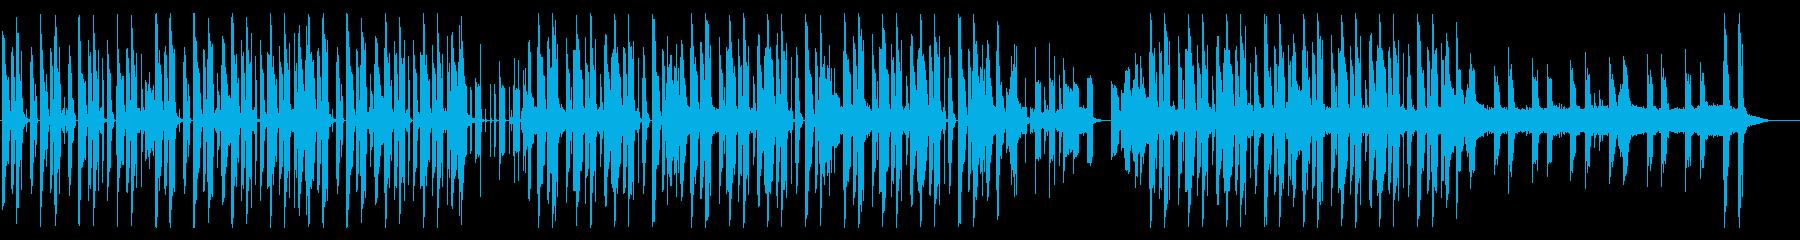 texture10の再生済みの波形